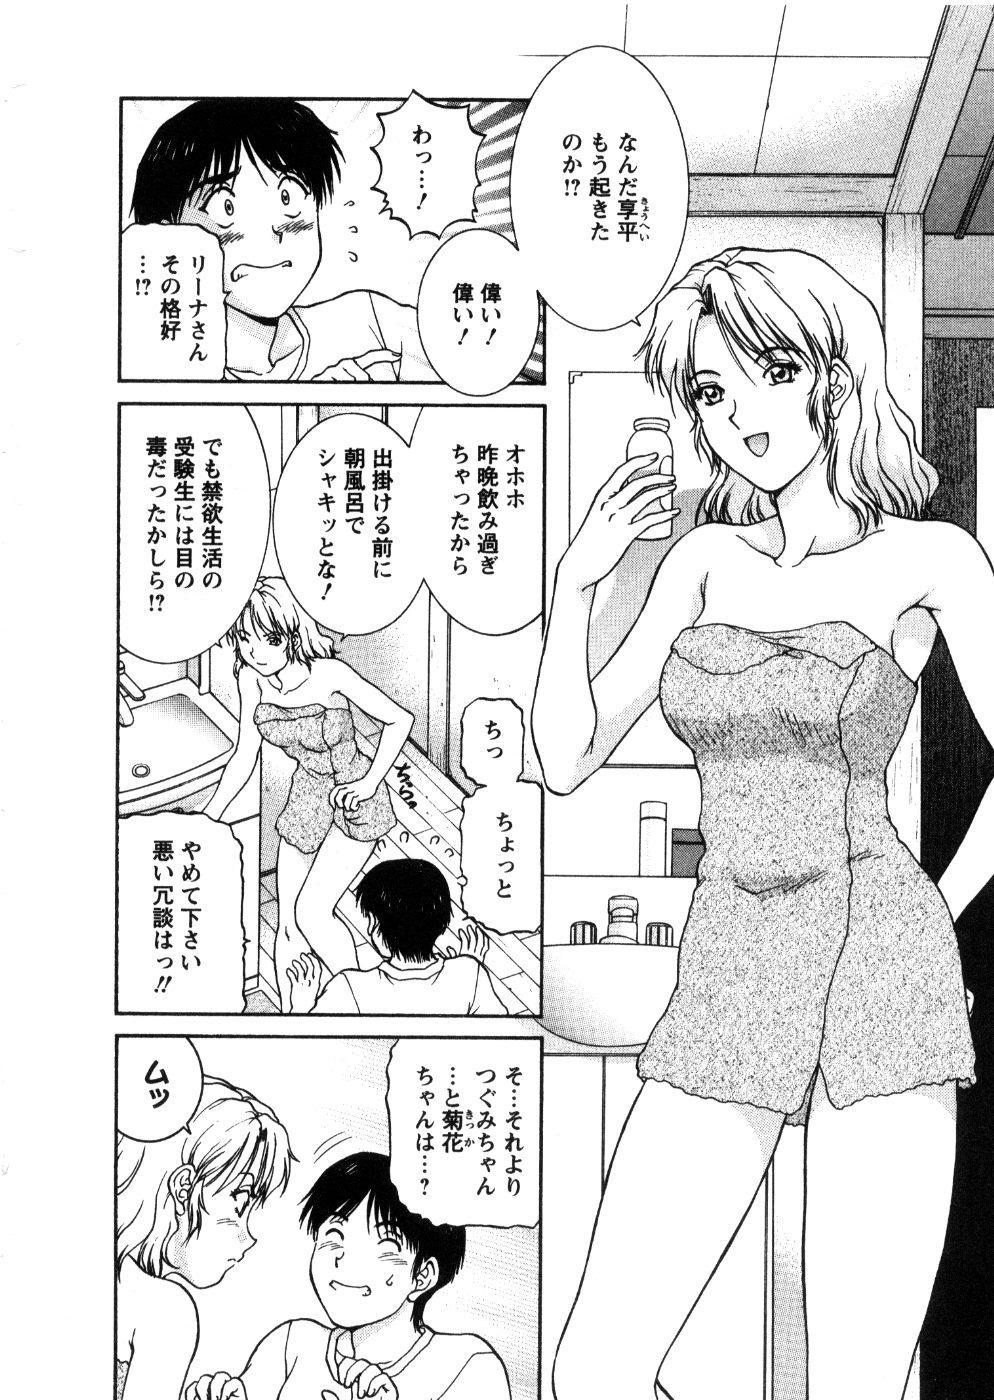 Oneechan-tachi ga Yatte Kuru 03 71